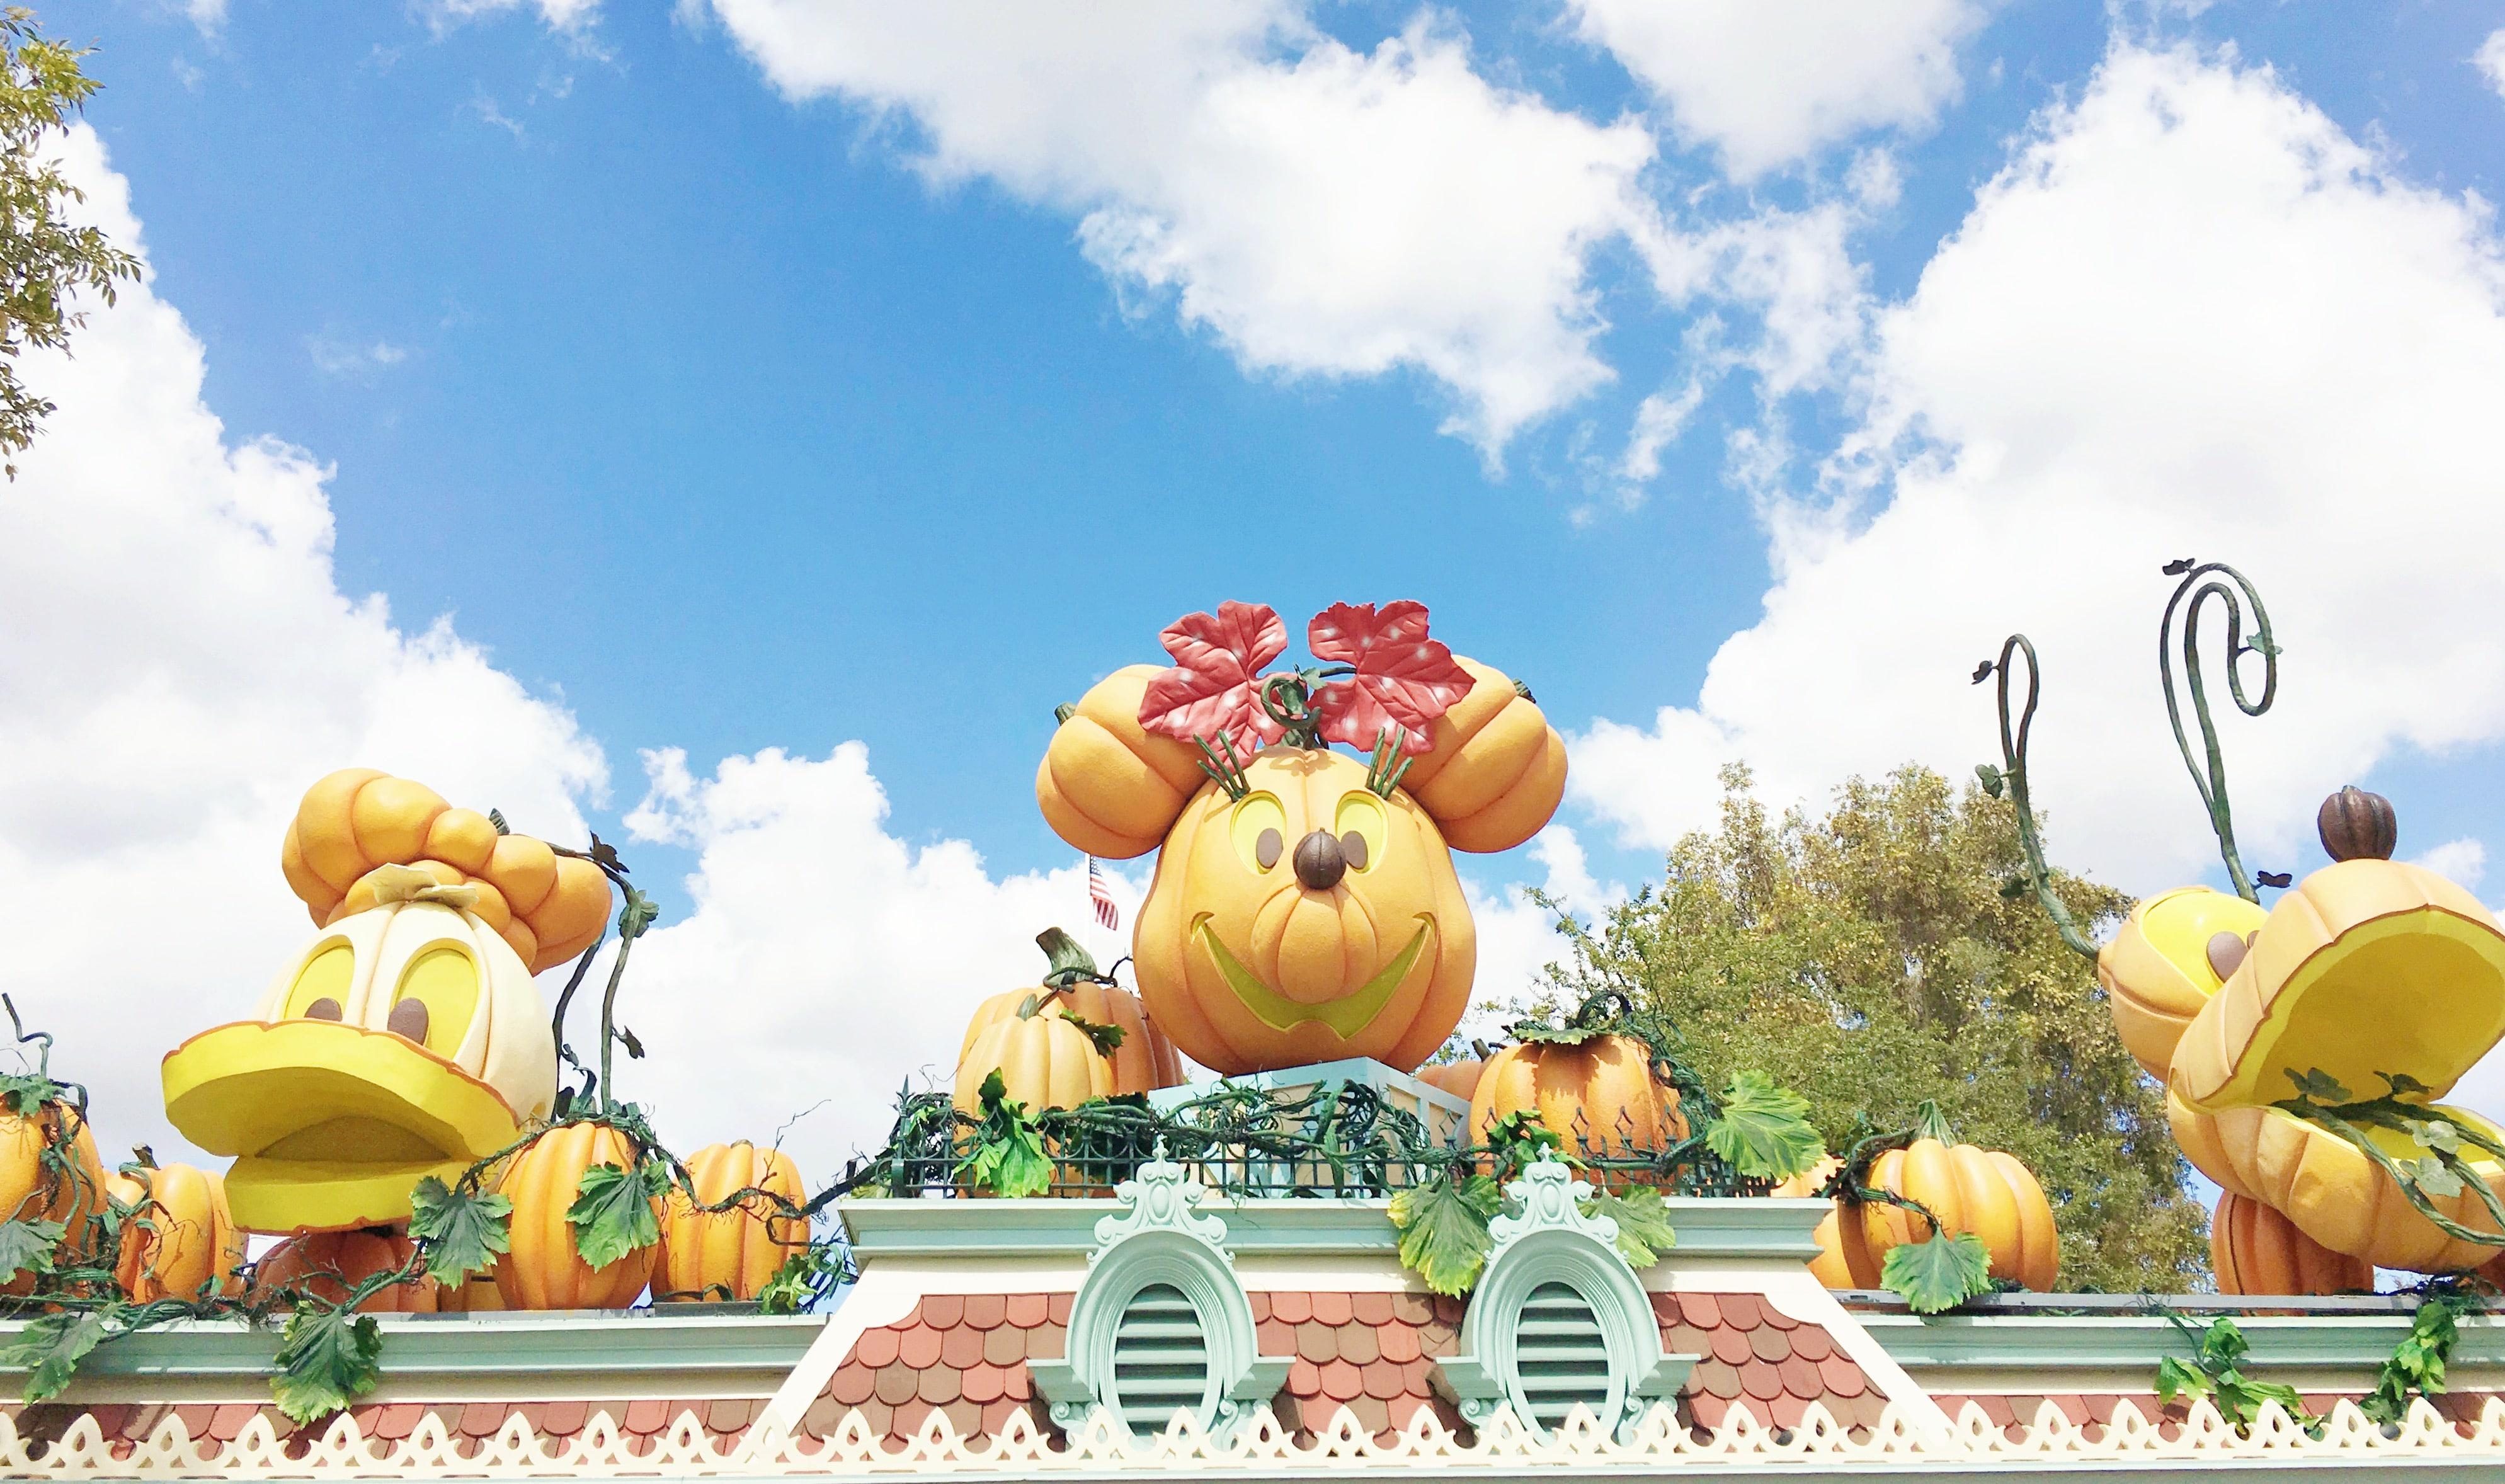 minnie pumpkin at disneyland